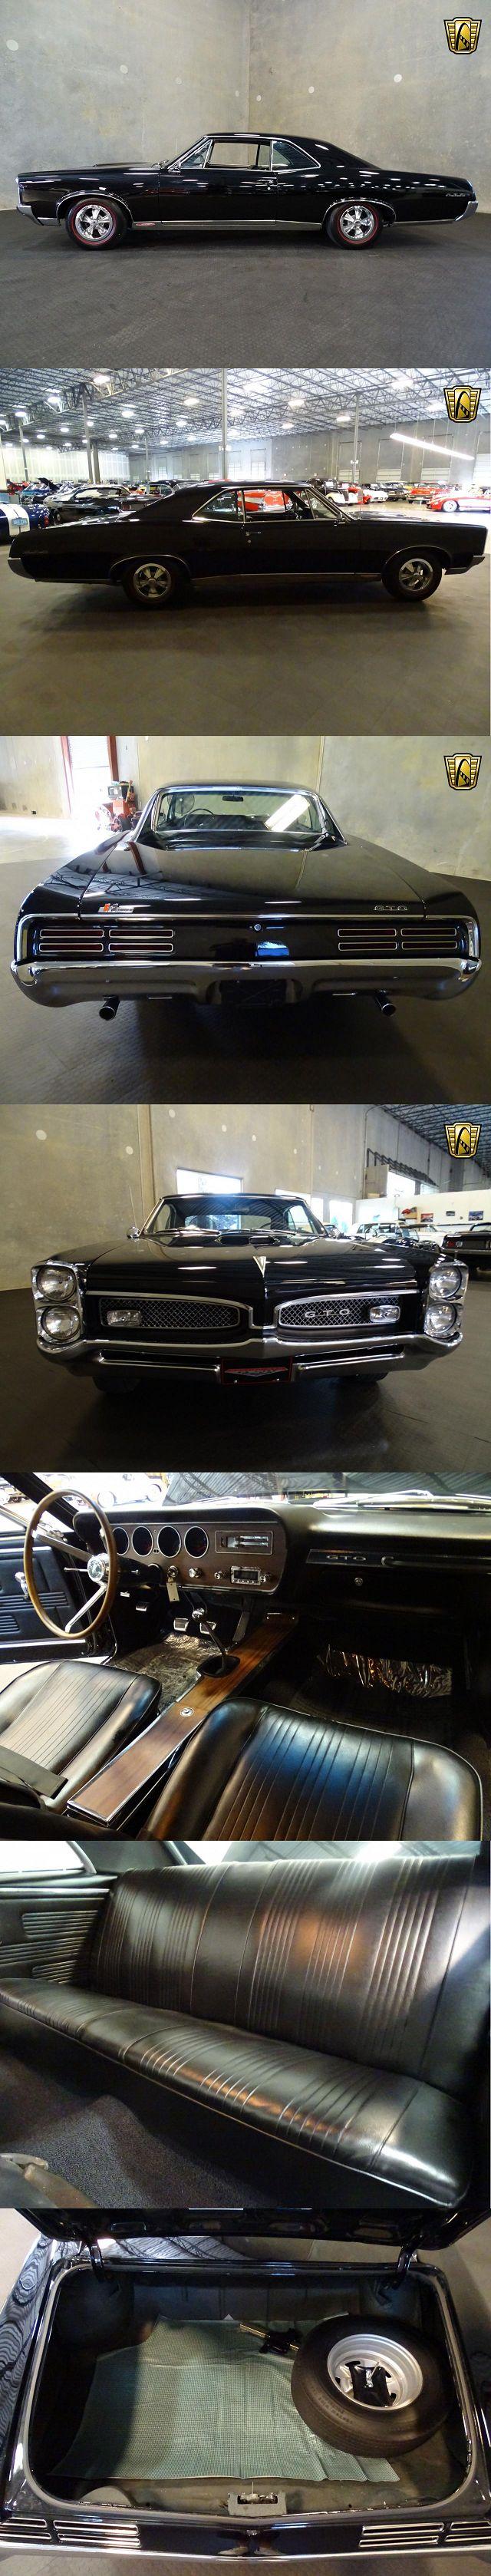 #1967 #PontiacGTO V8 H.O. 400 CID 4 Speed Manual